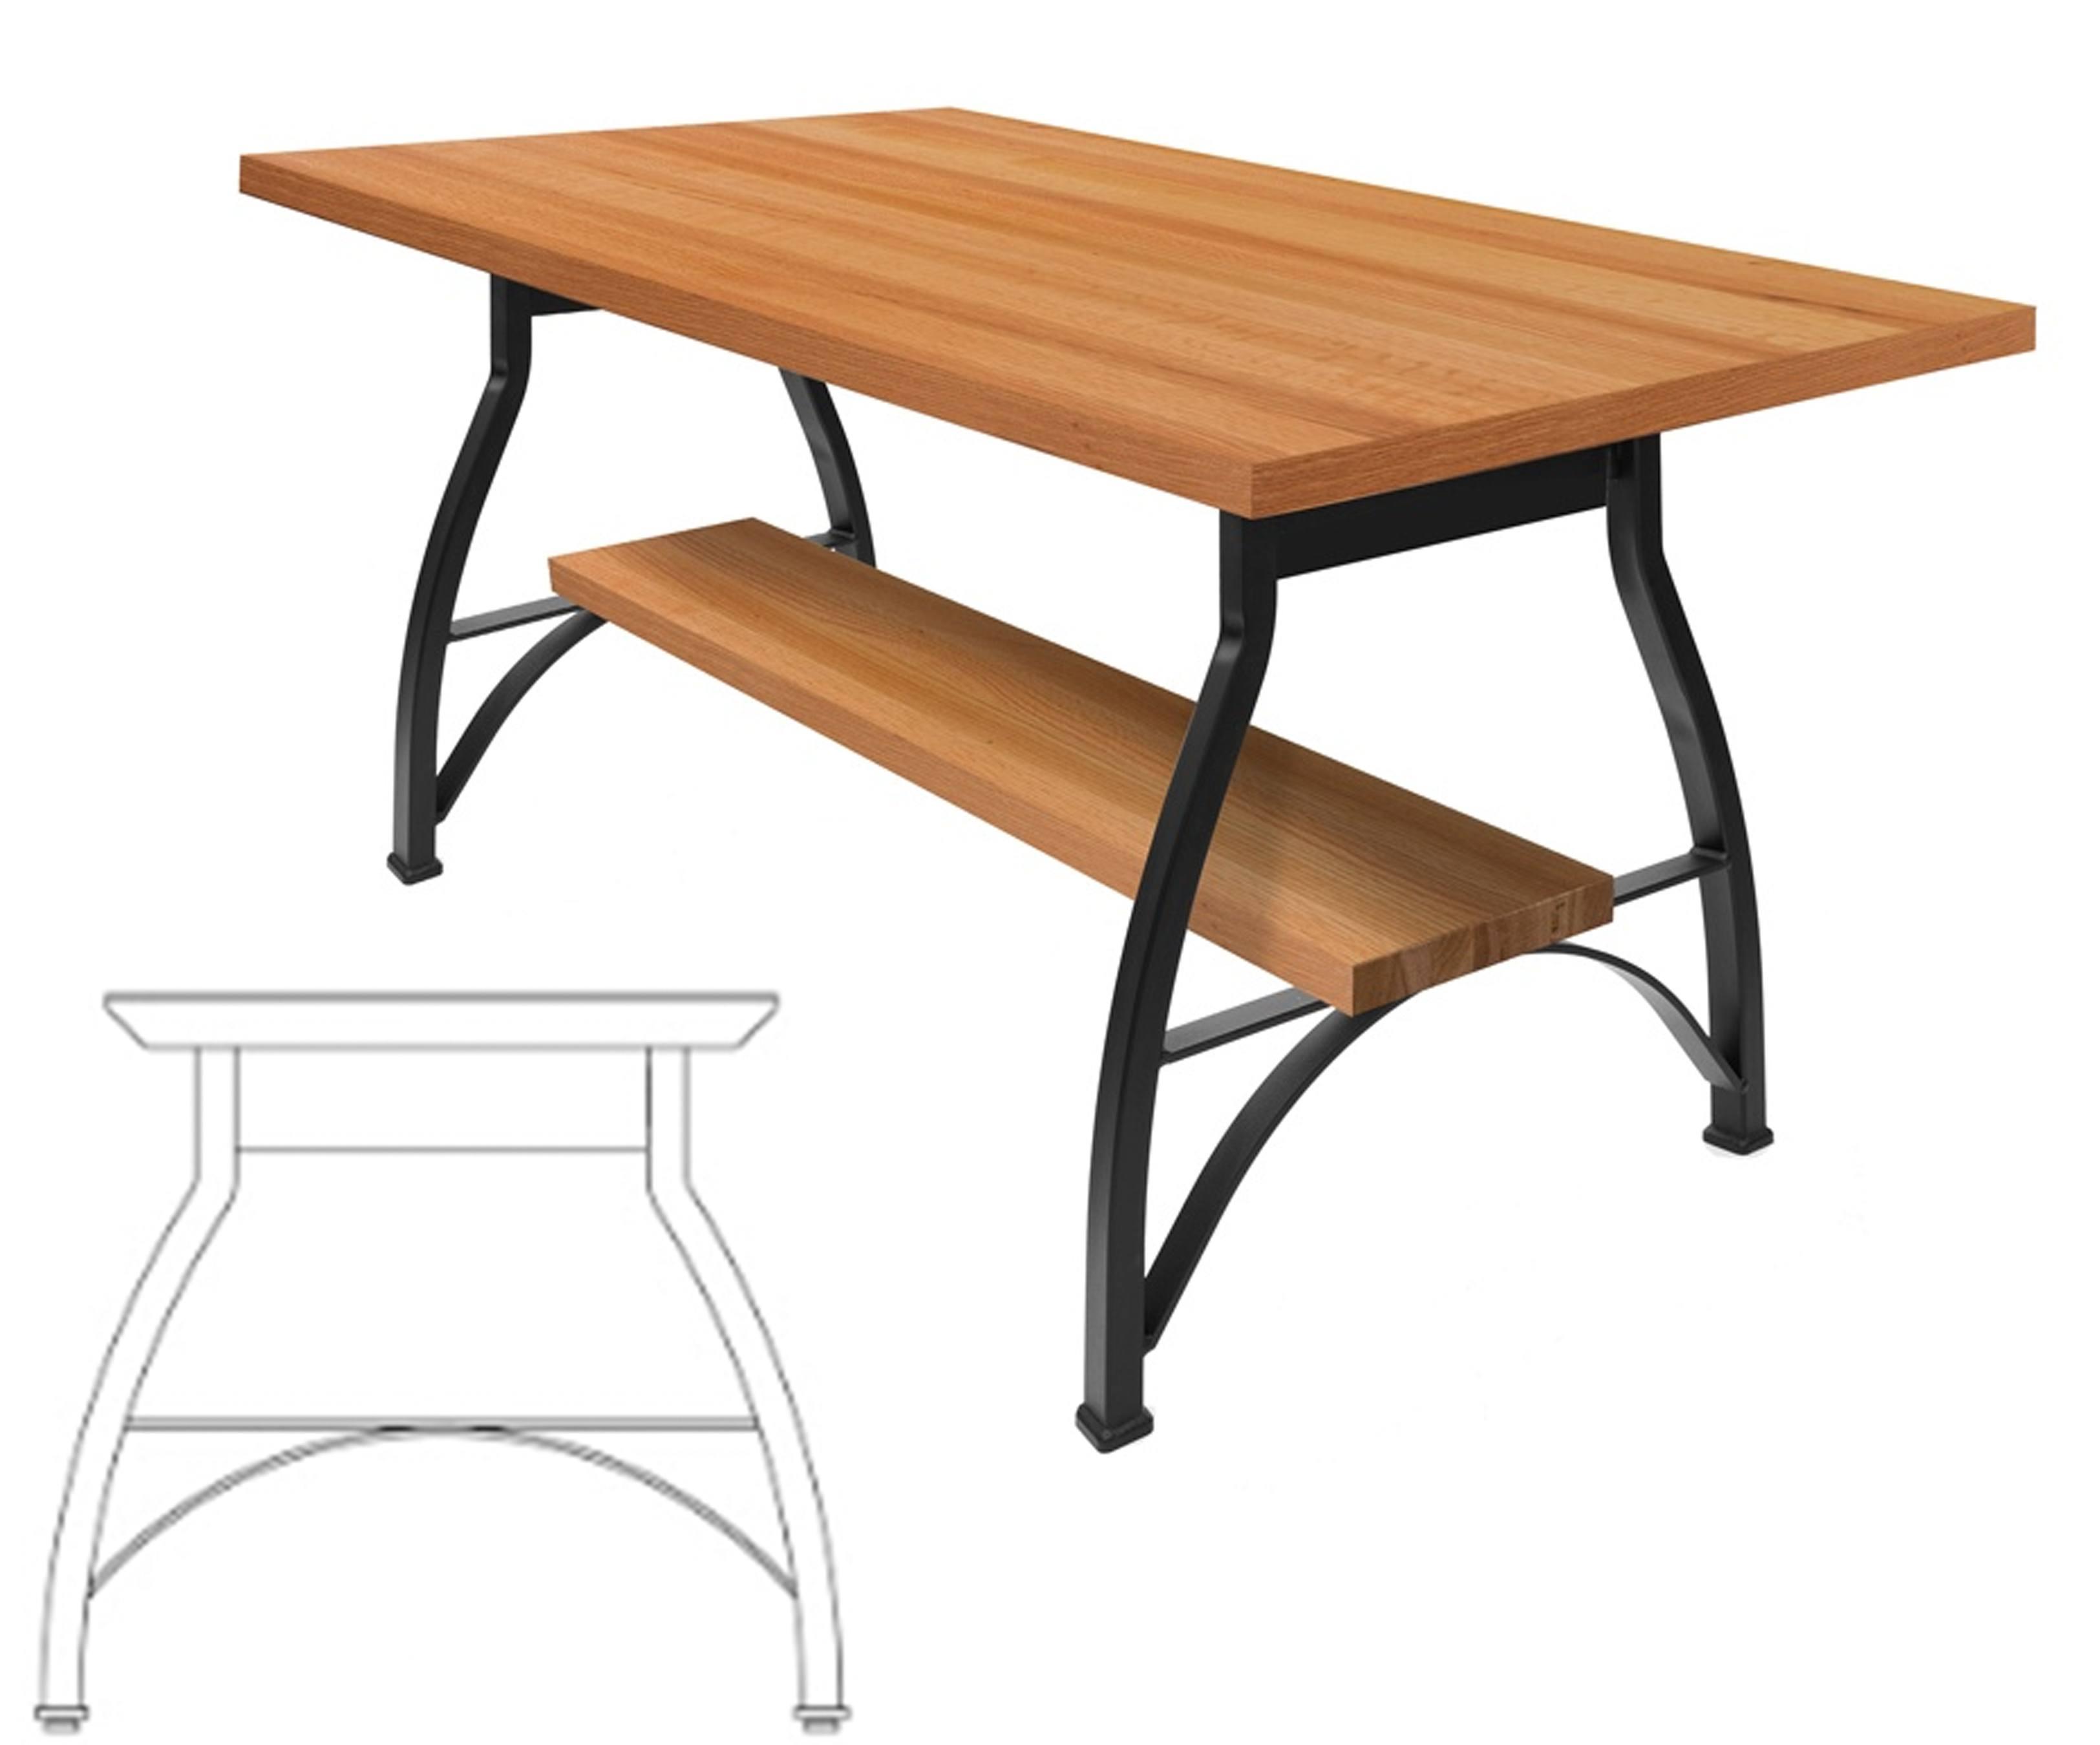 John Boos Foundry Oak Dining Dining Tables